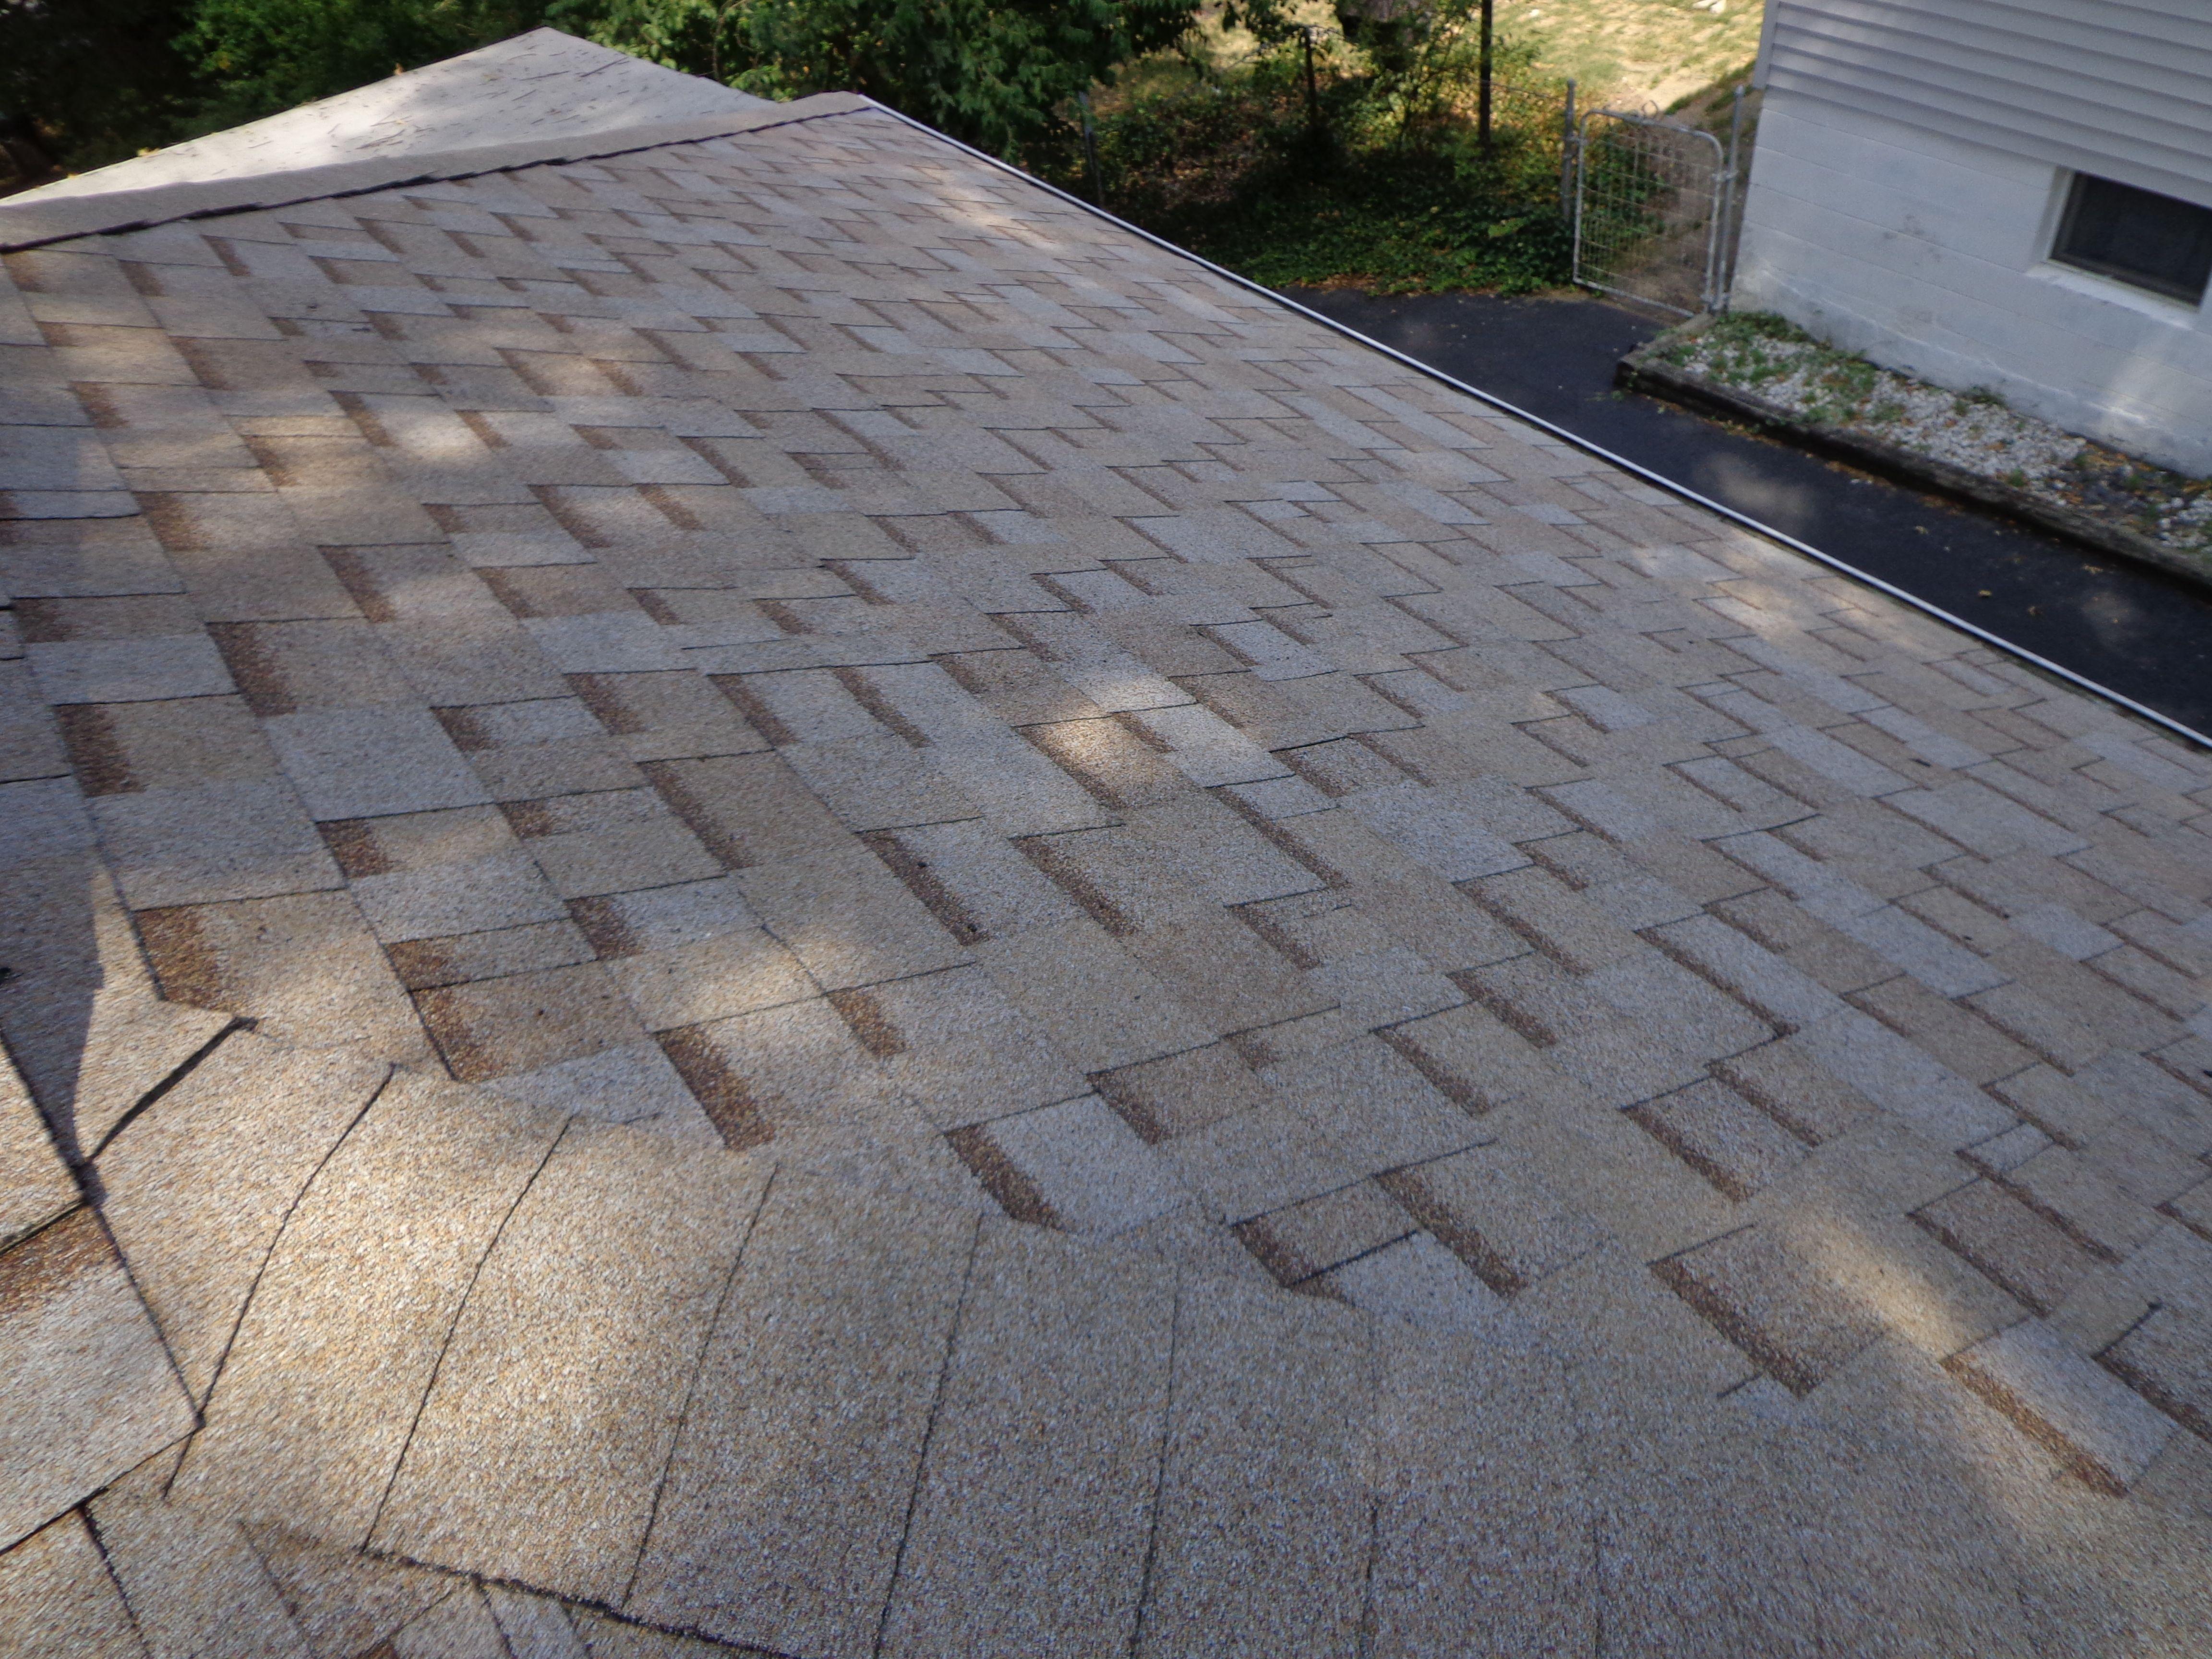 Best Owens Corning Oakridge Amber Residential Roofing 400 x 300